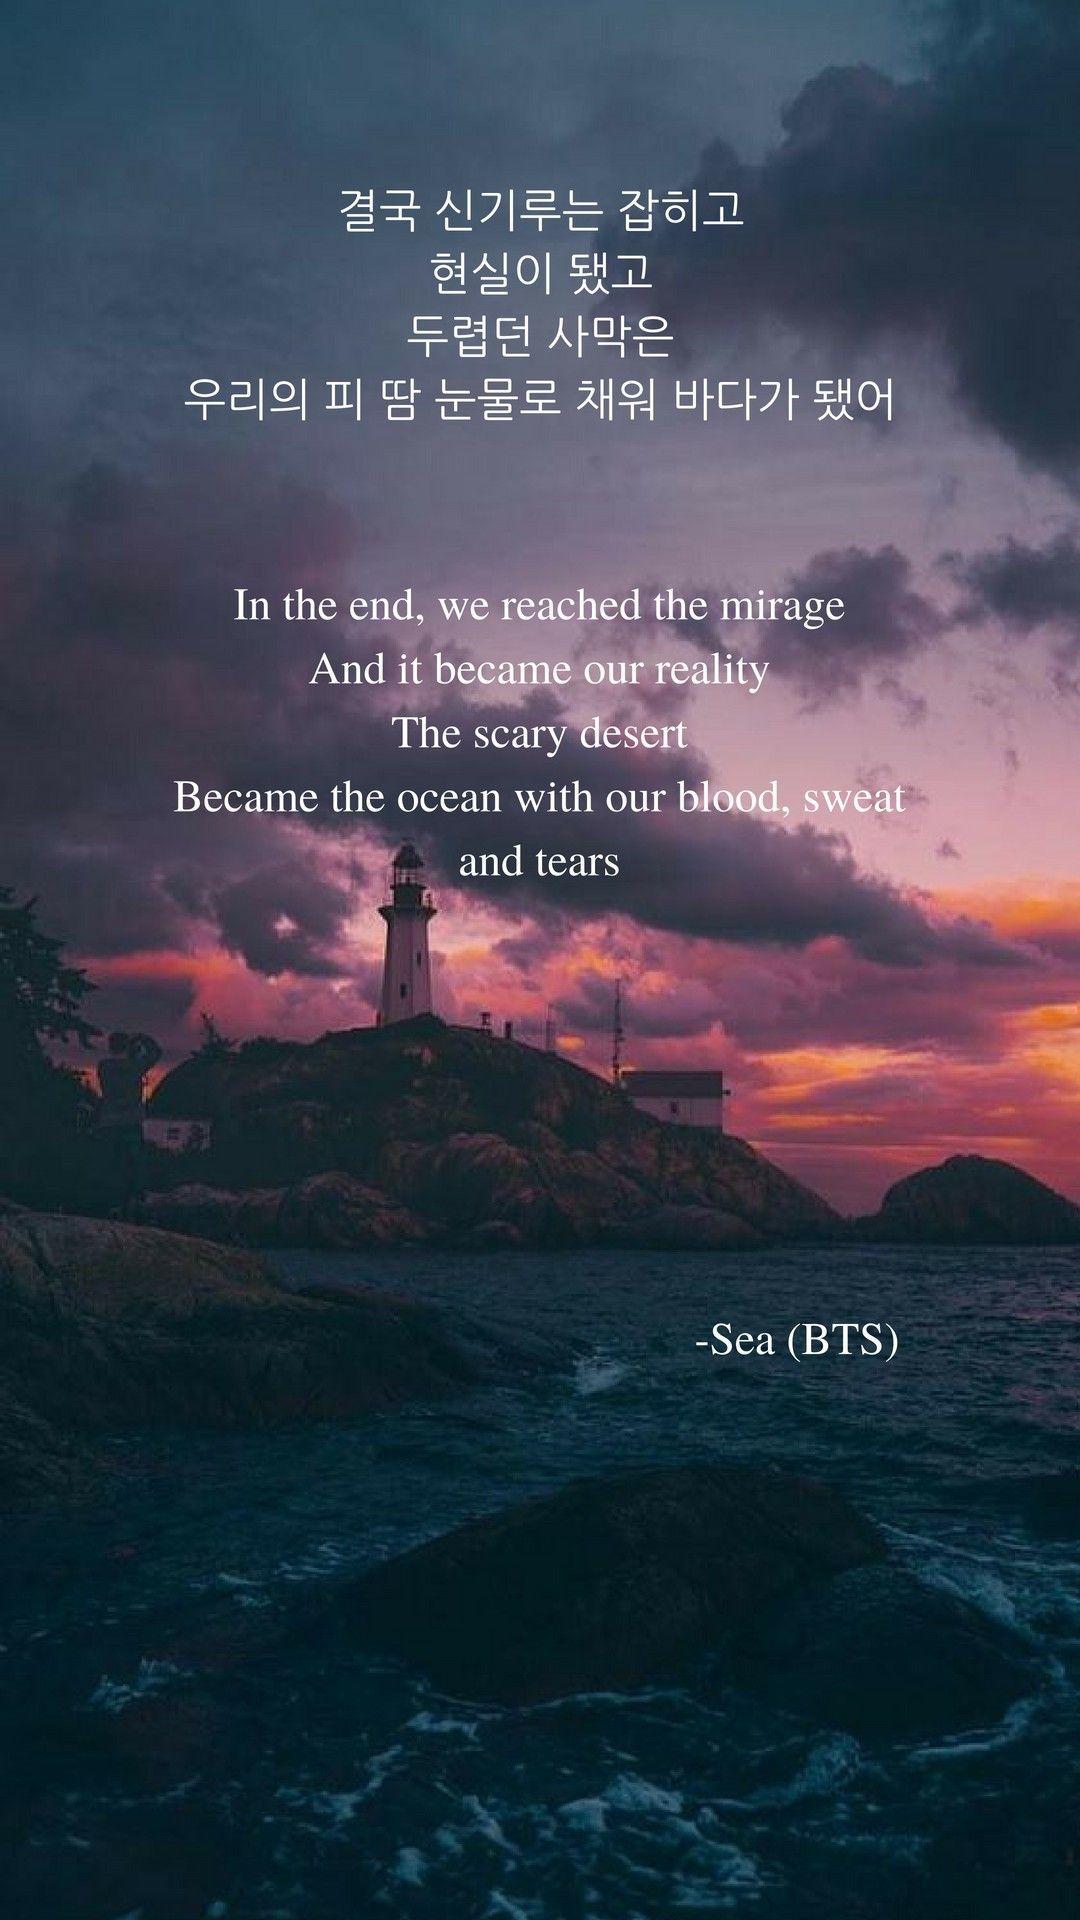 Sea Bts Lyrics Wallpaper Bts Lyric Bts Wallpaper Lyrics Bts Lyrics Quotes